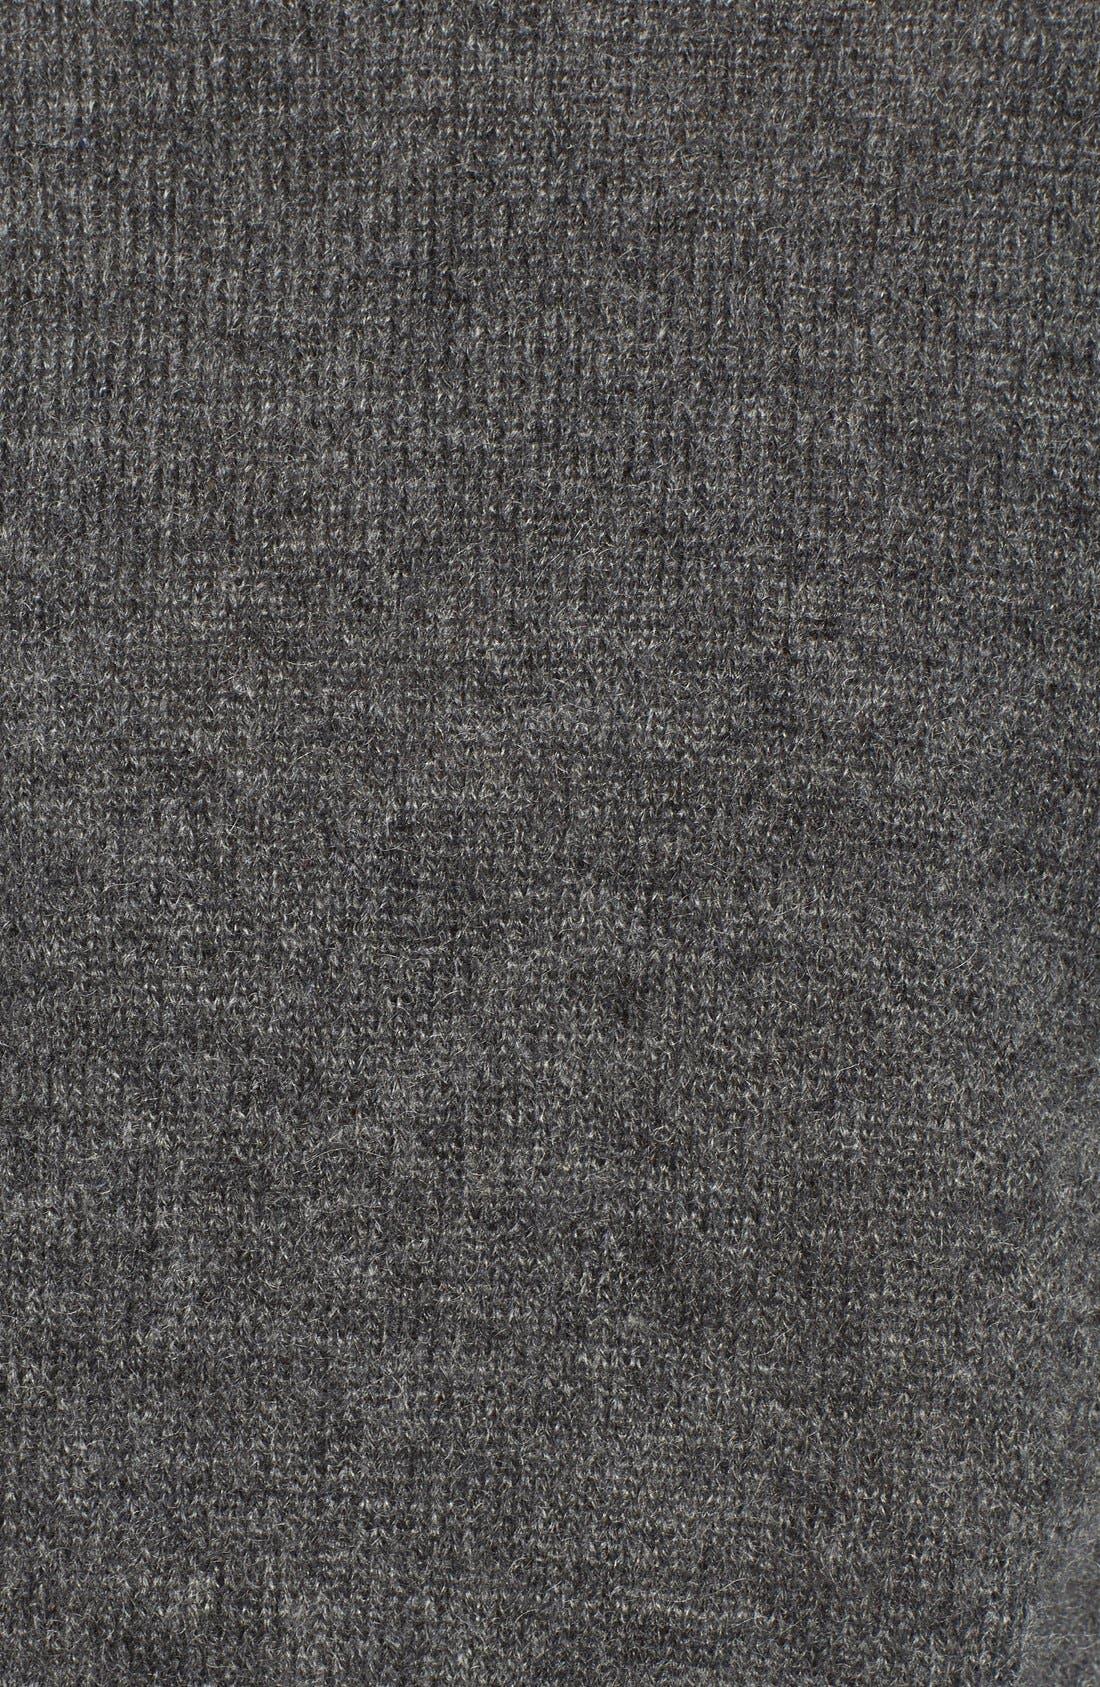 Alternate Image 5  - M.i.h. Jeans 'Delo' Mohair Blend Crewneck Sweater